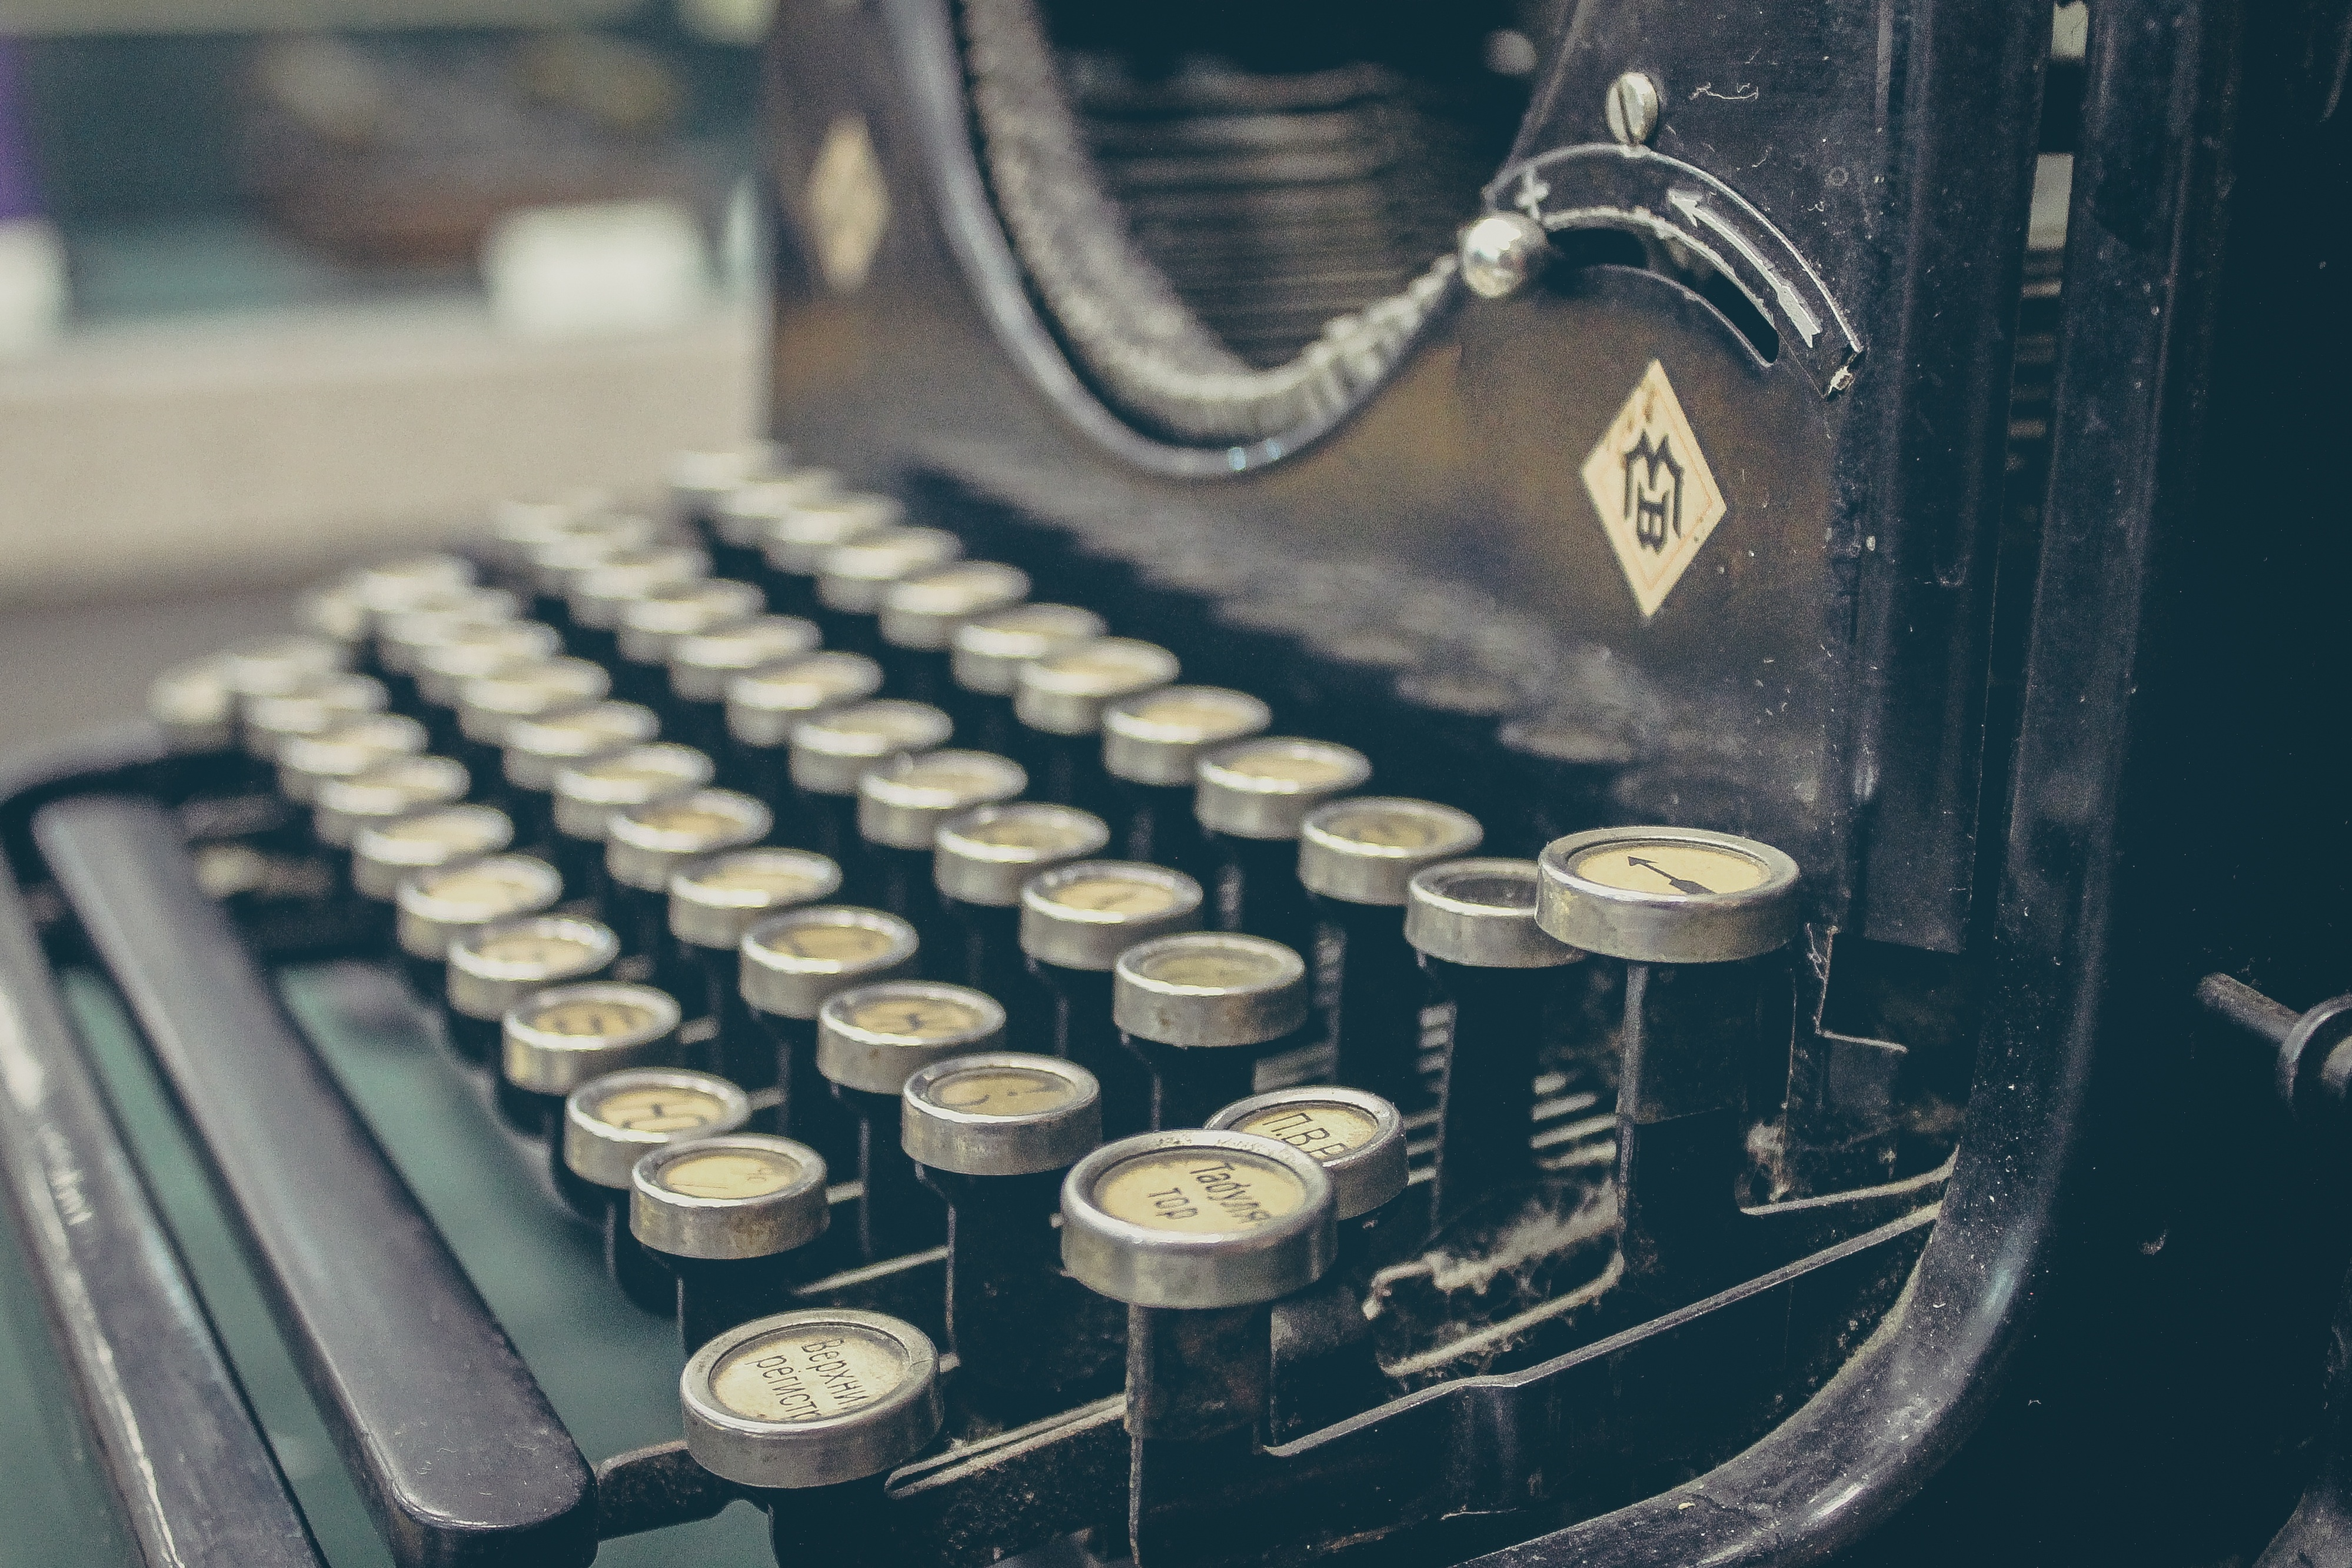 old black typewriter with paper jpg